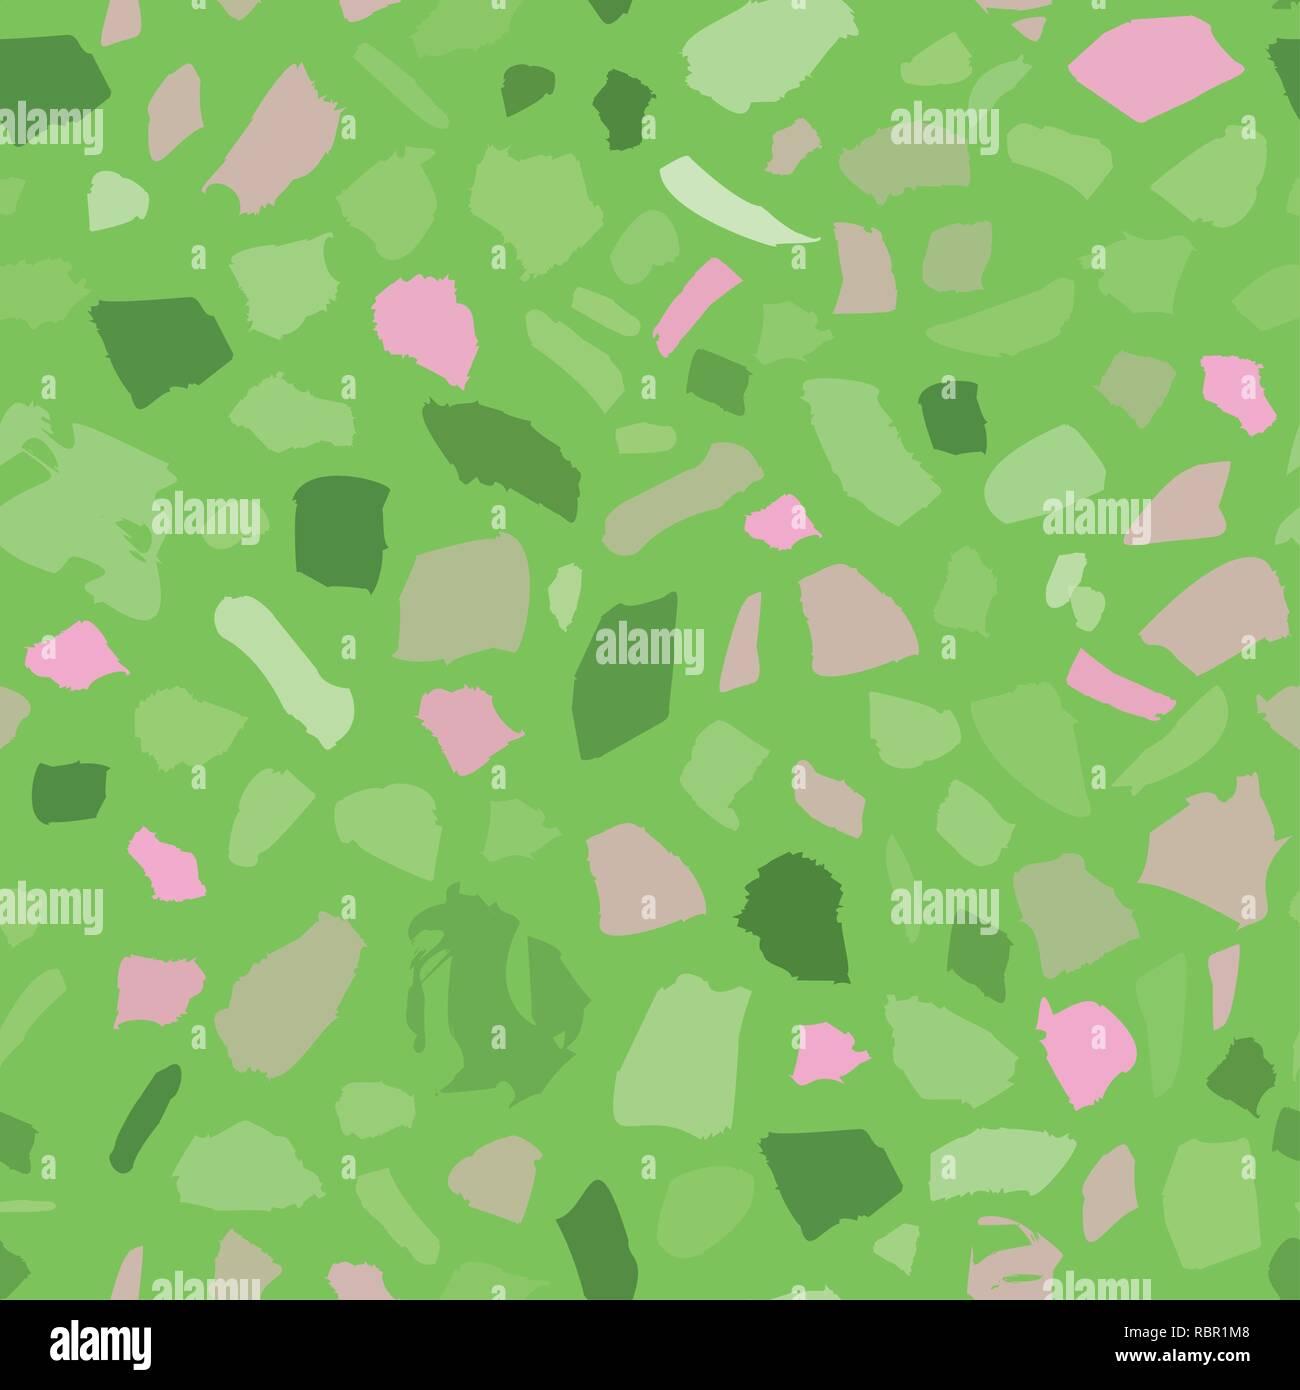 Download 5500 Koleksi Background Alami Gratis Terbaik